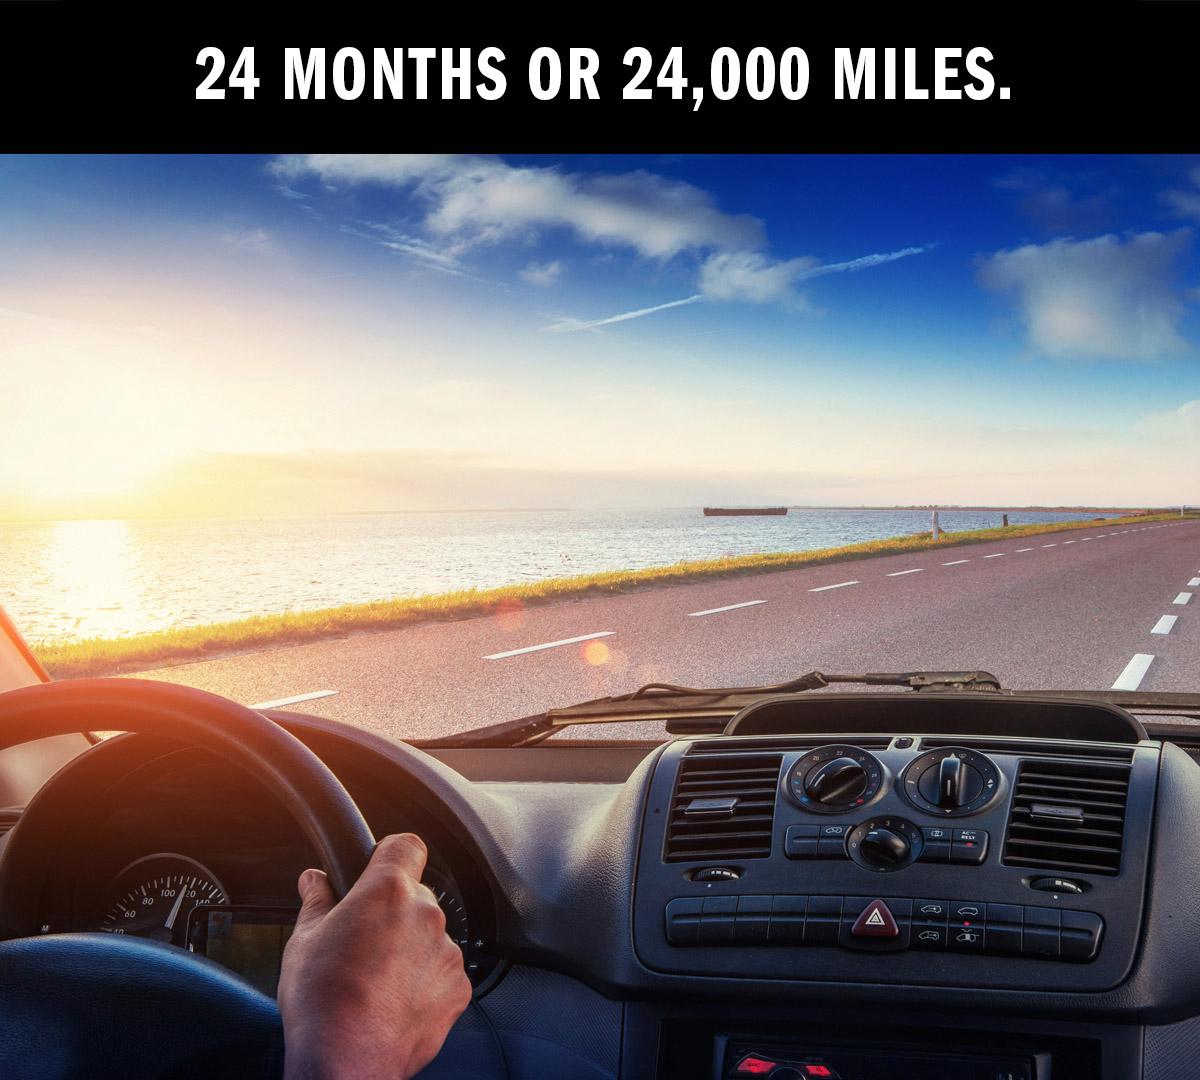 technet_nationwide_warranty_24_months_24,000_miles